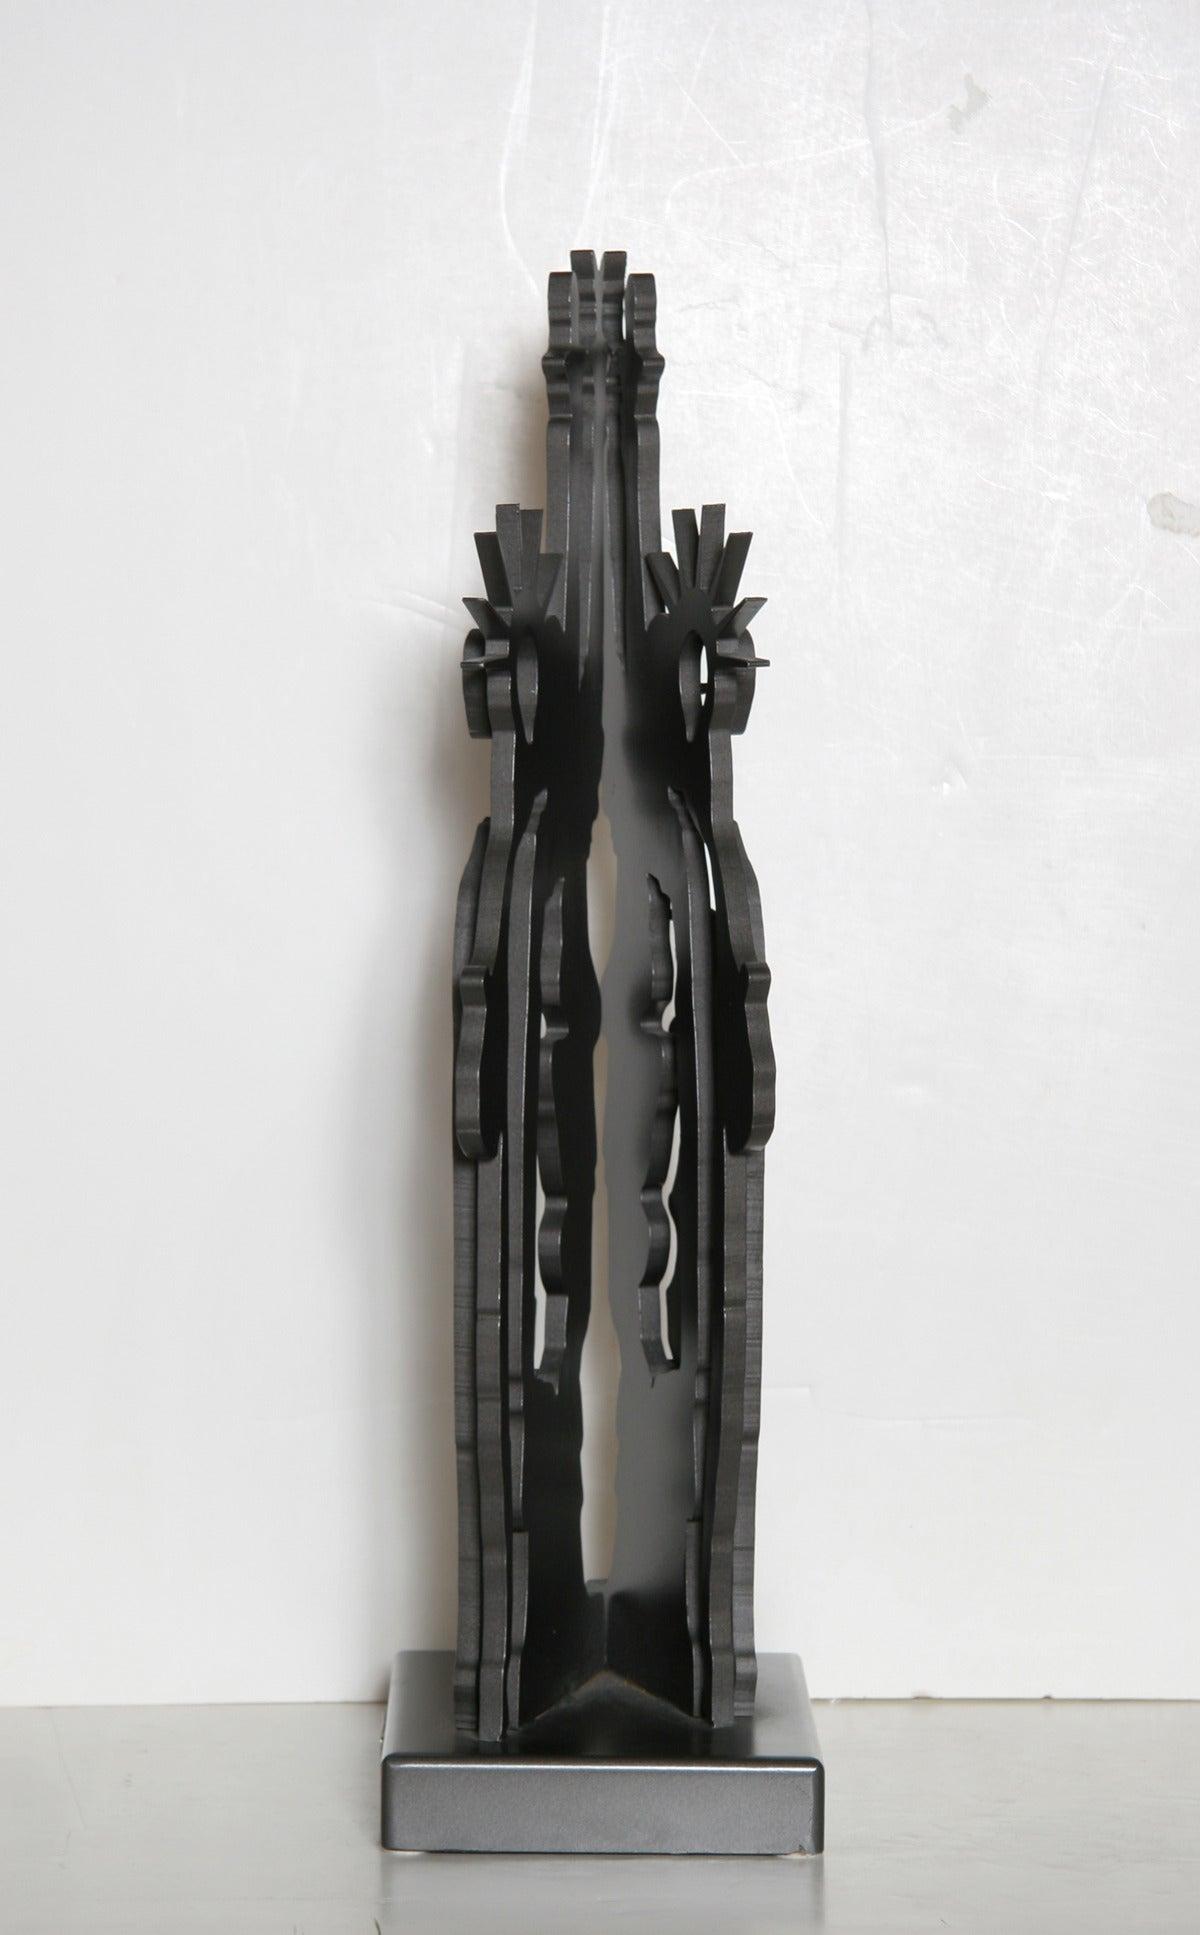 Statue of Liberty - Le Fantome de la Liberte - Conceptual Sculpture by Fernandez Arman